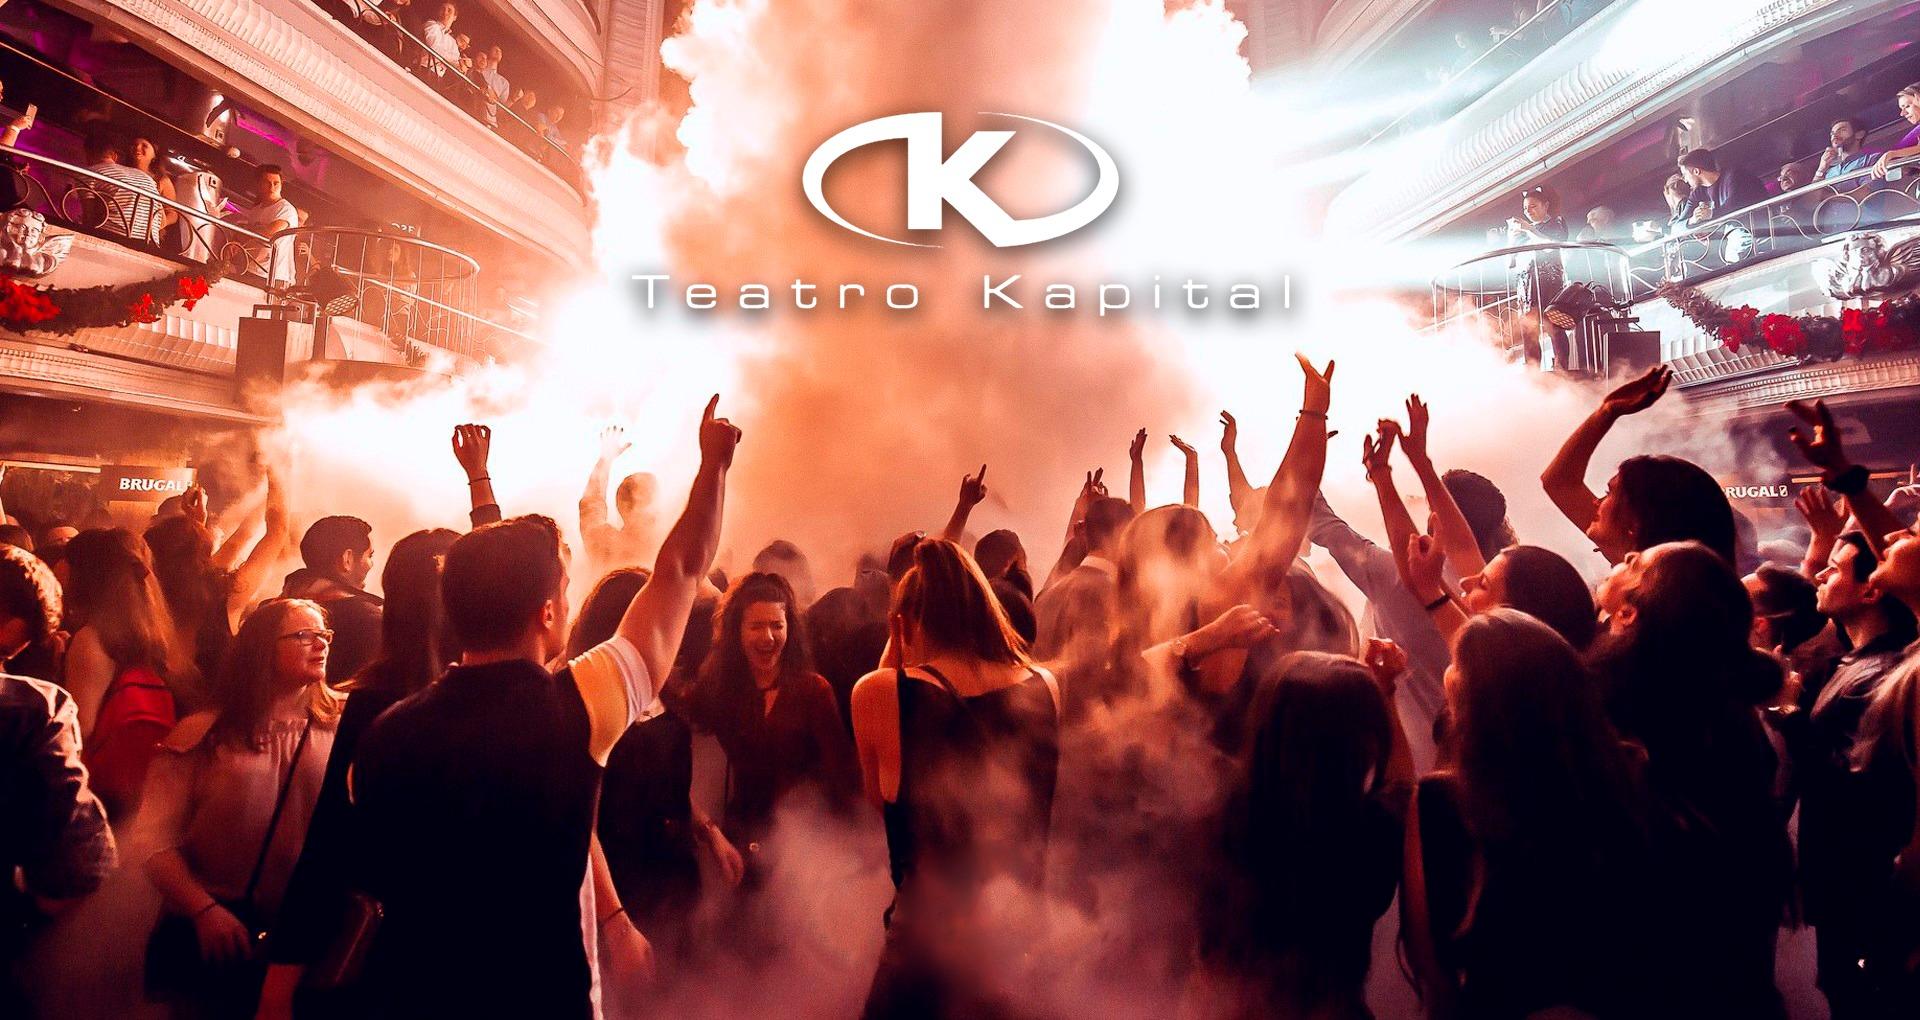 Kapital Viernes - Club Teatro Kapital